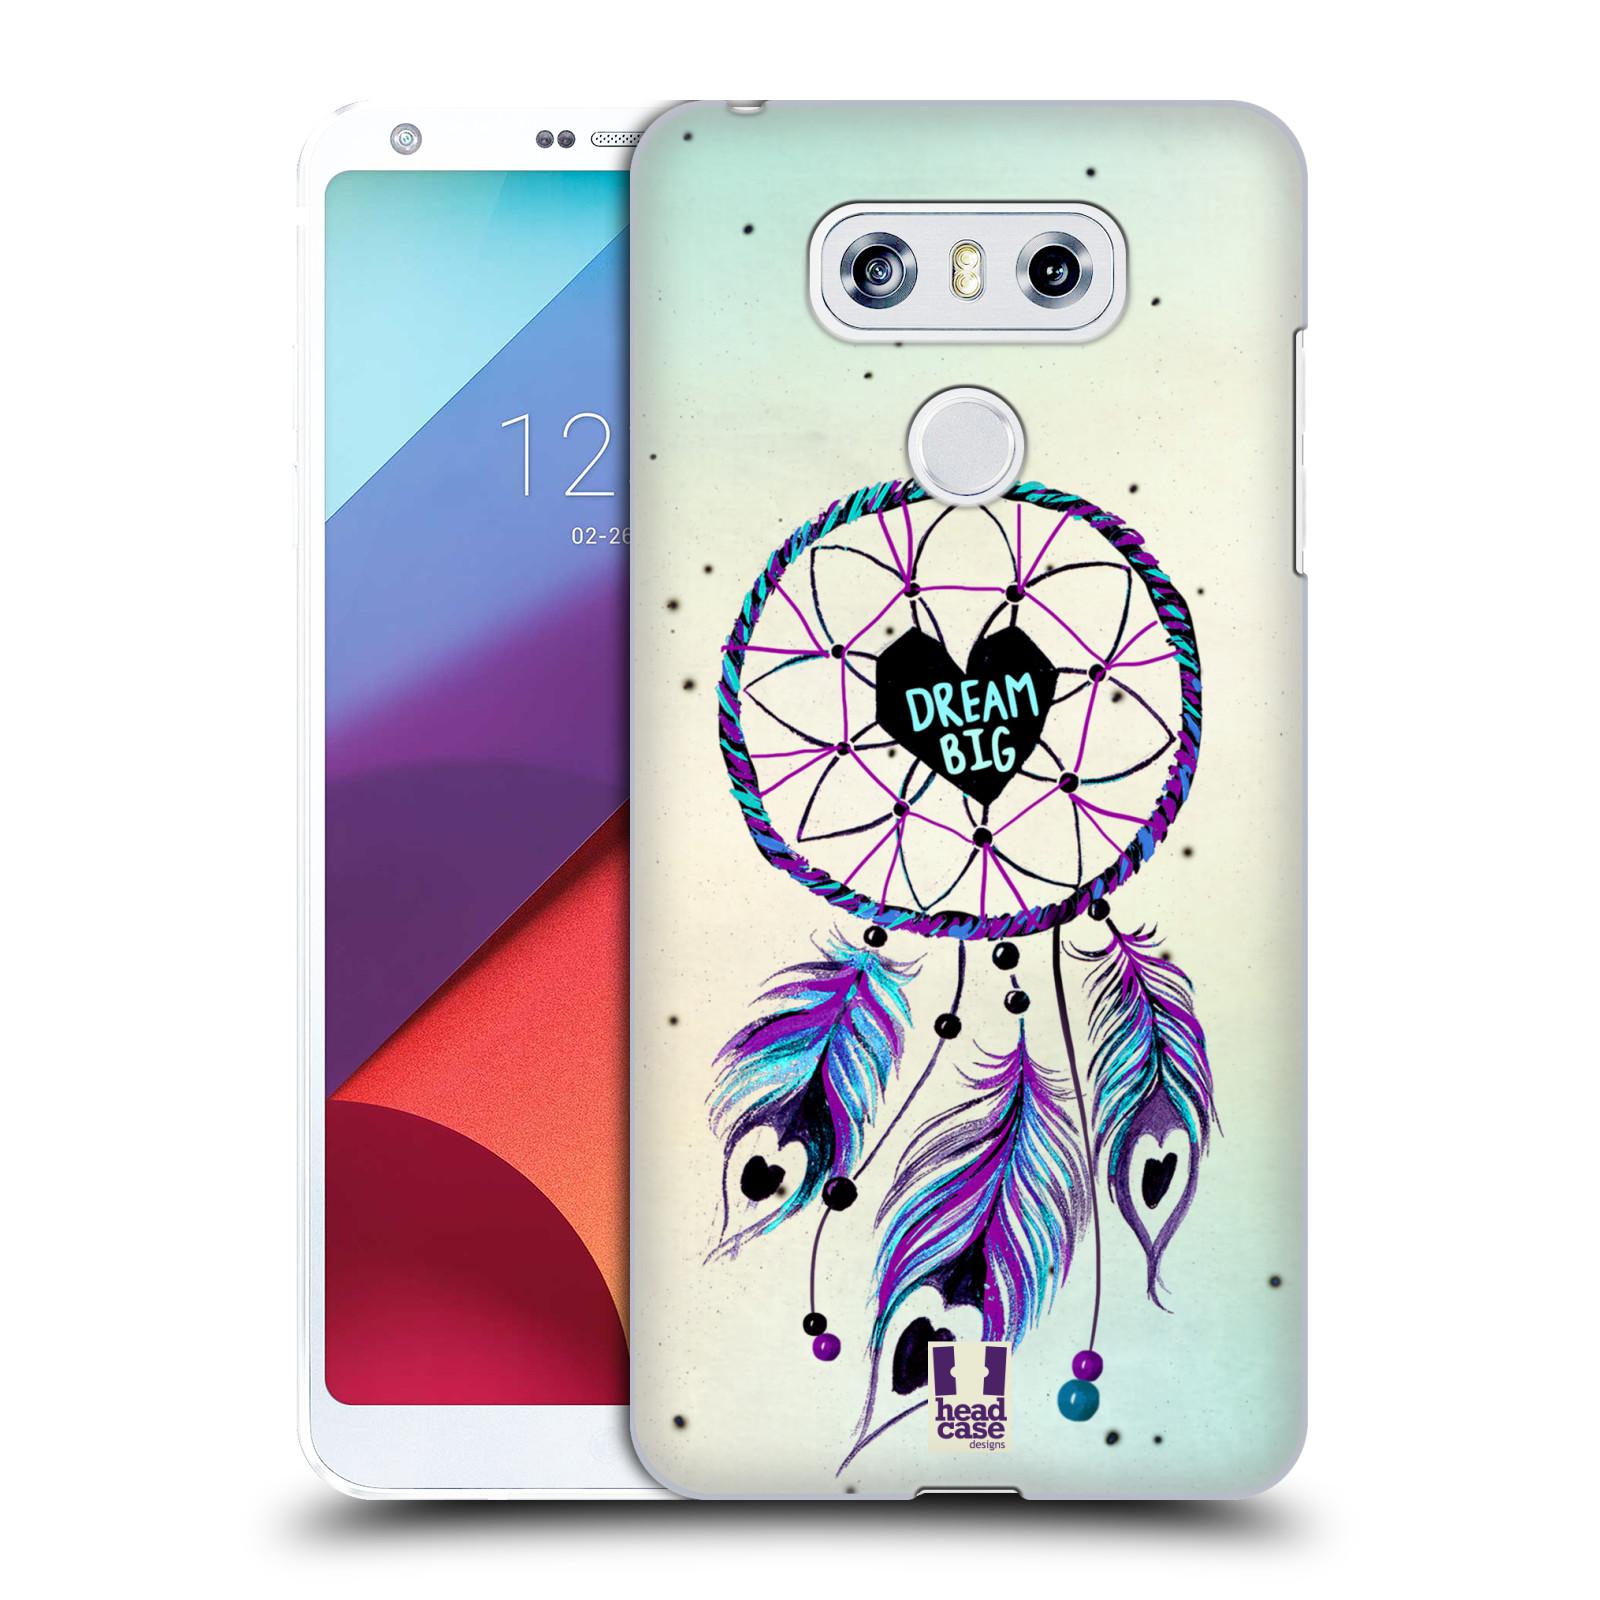 Plastové pouzdro na mobil LG G6 - Head Case Lapač Assorted Dream Big Srdce